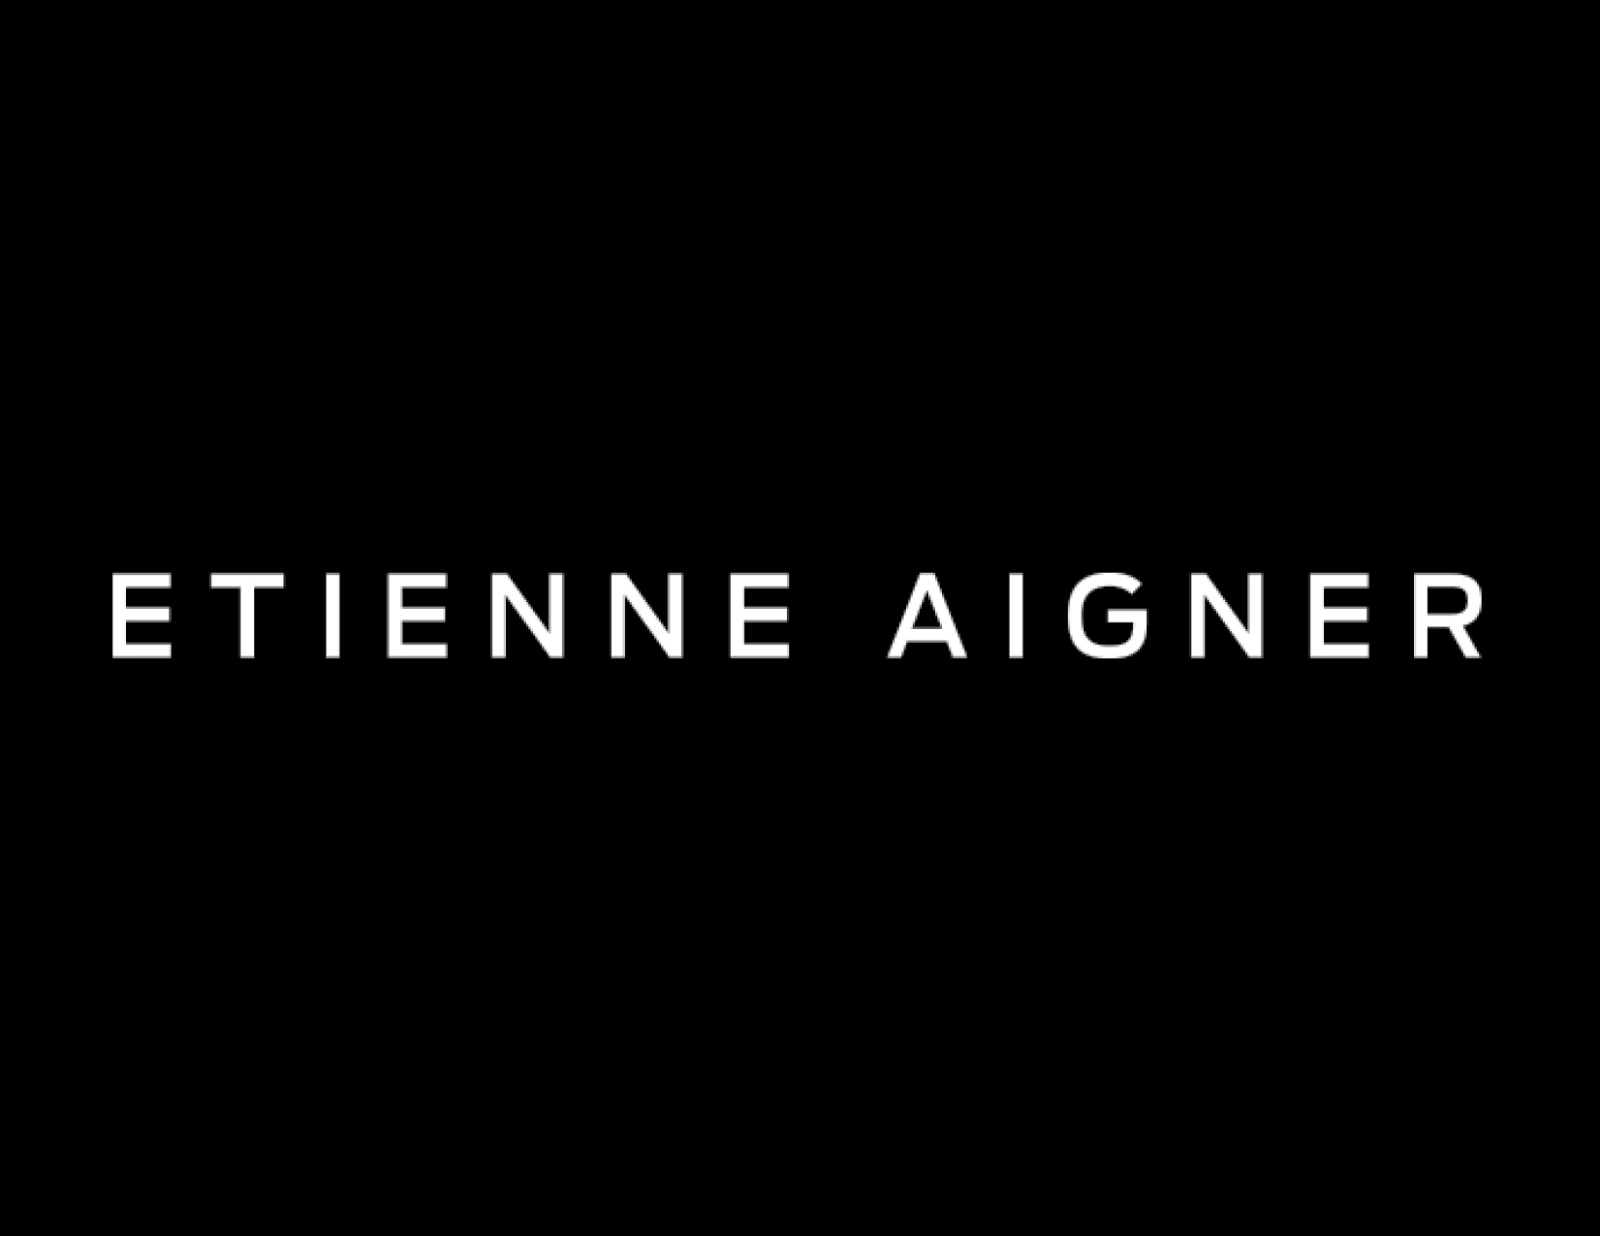 http://www.etienneaigner.com/